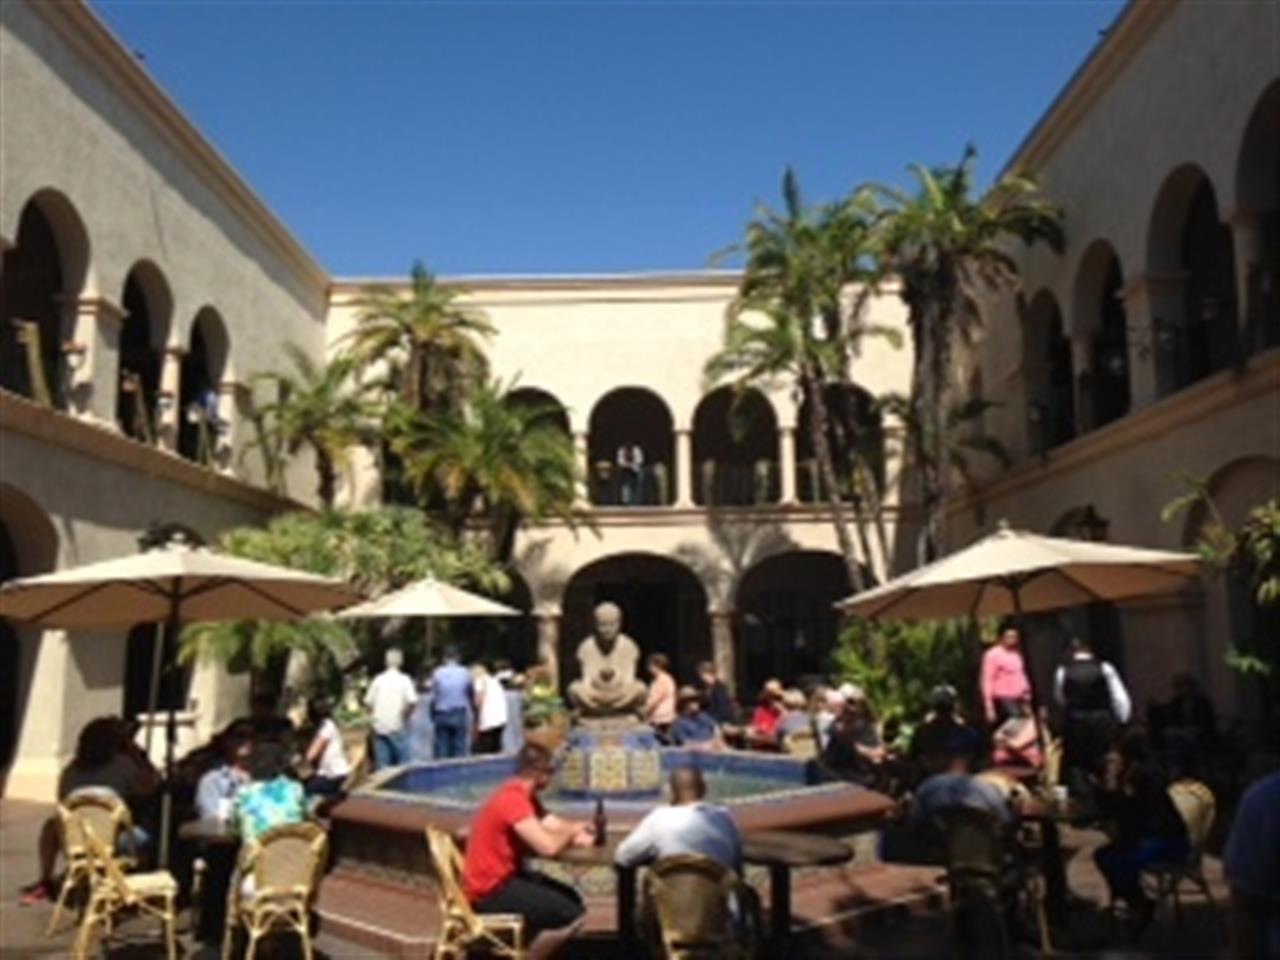 #San Diego #Balboa Park #LeadingRElocal